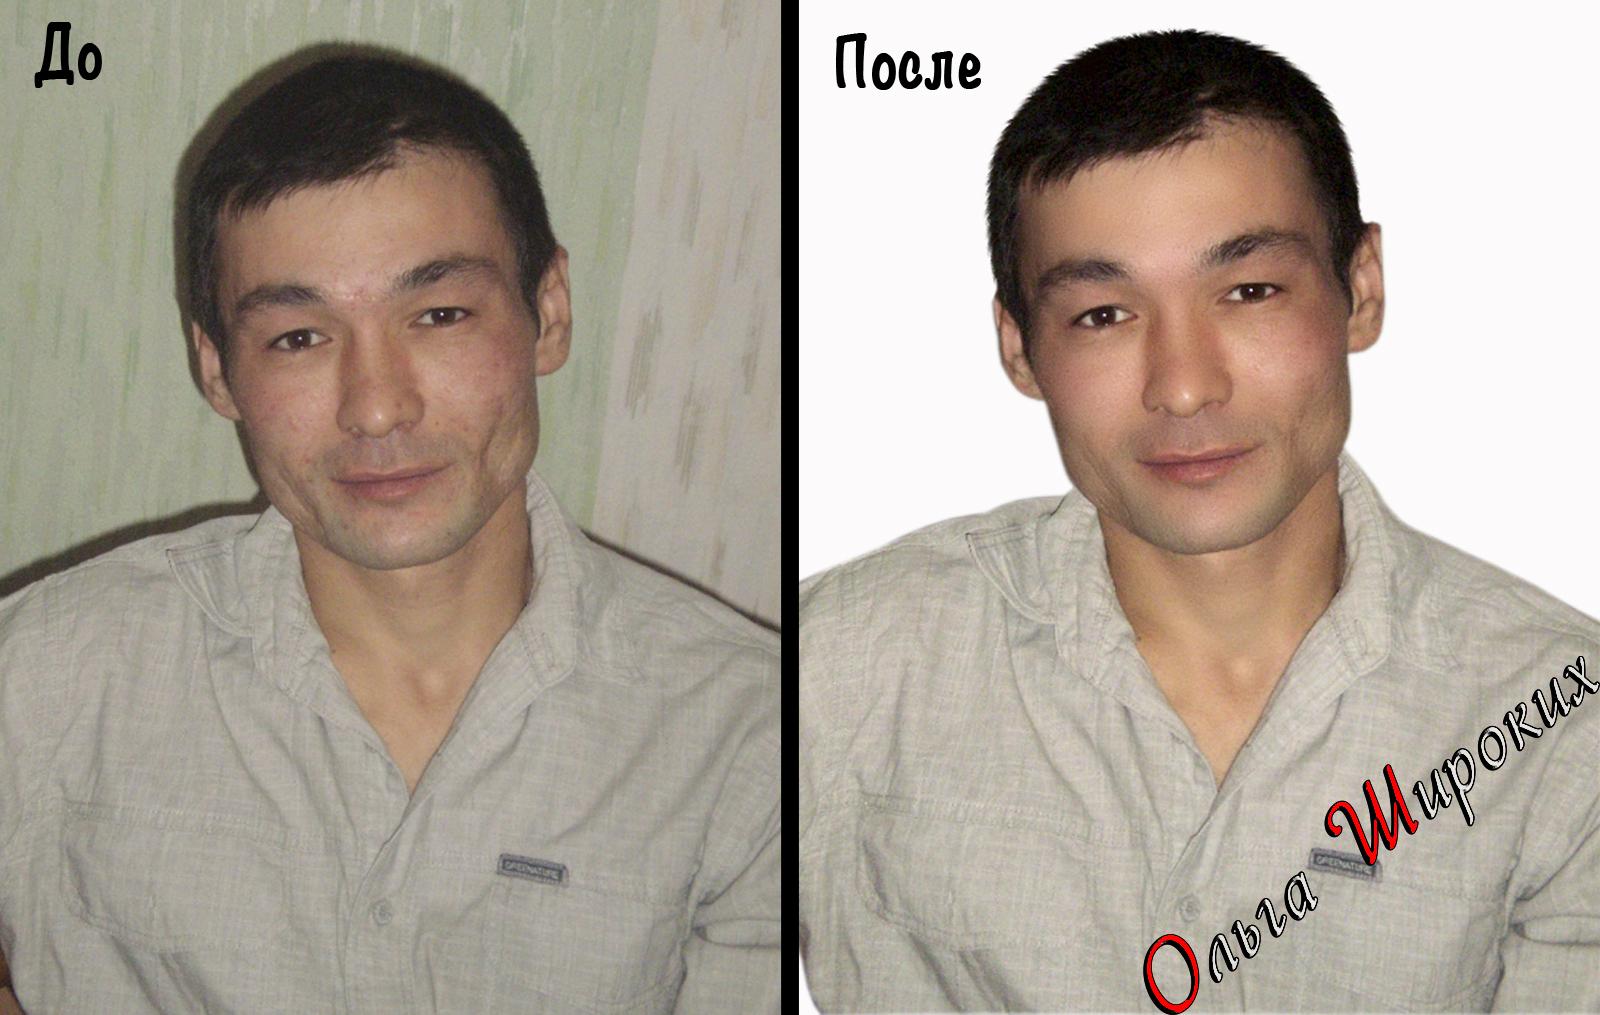 Ретушь кожи лица мужского портрета